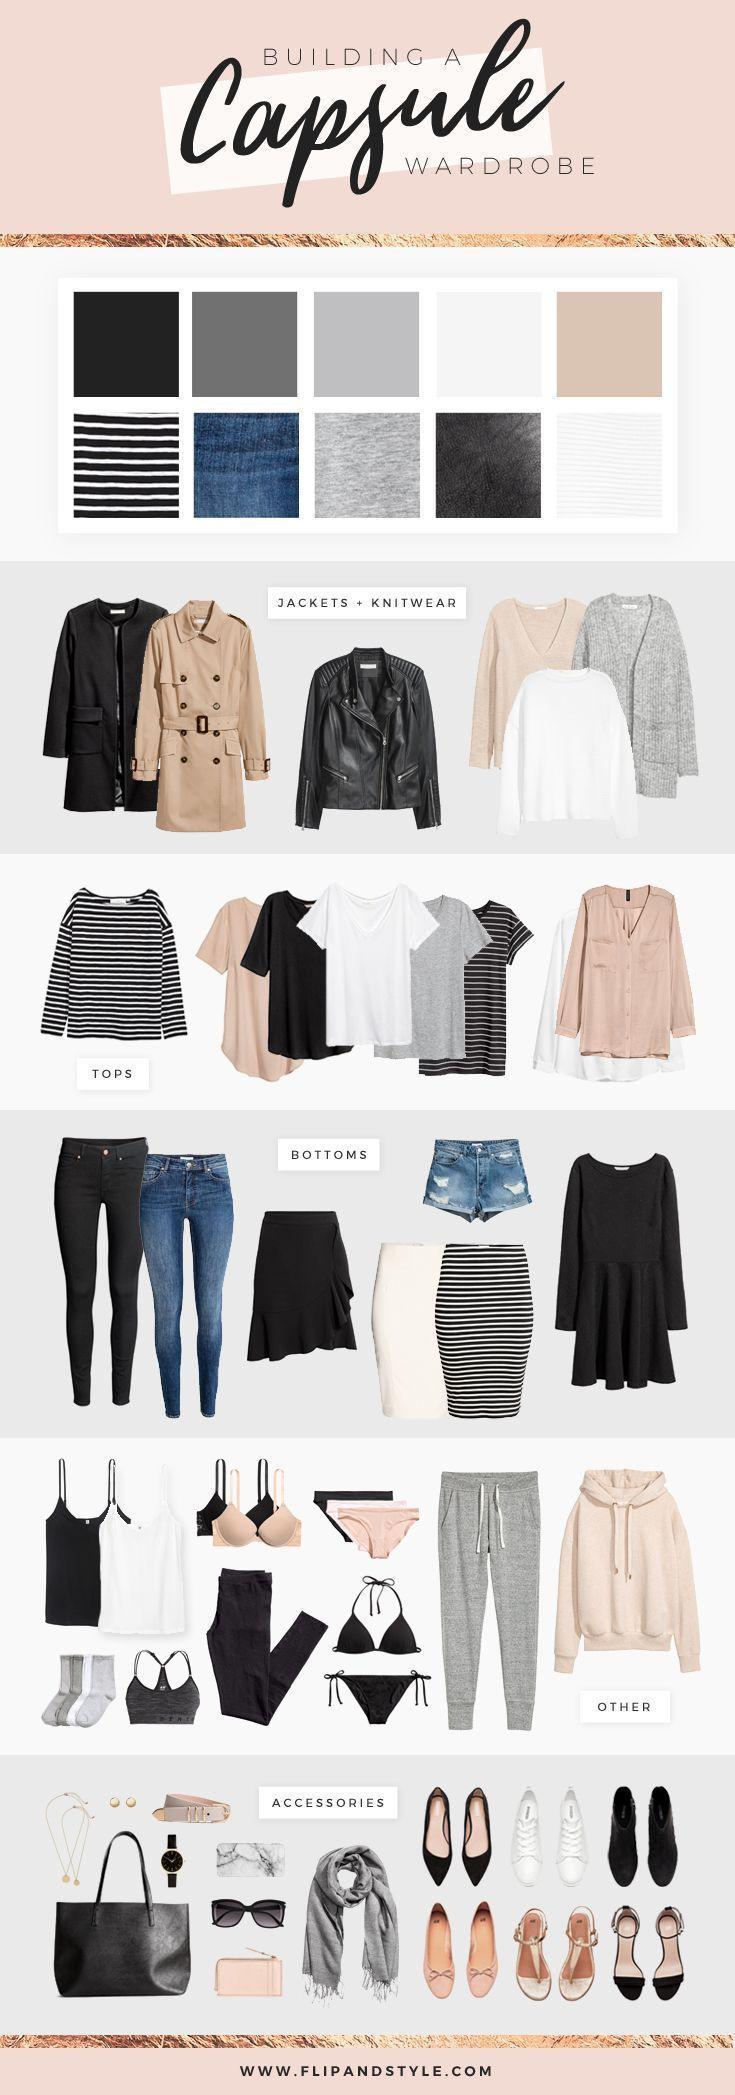 best 25+ outfit essentials ideas on pinterest | basic wardrobe